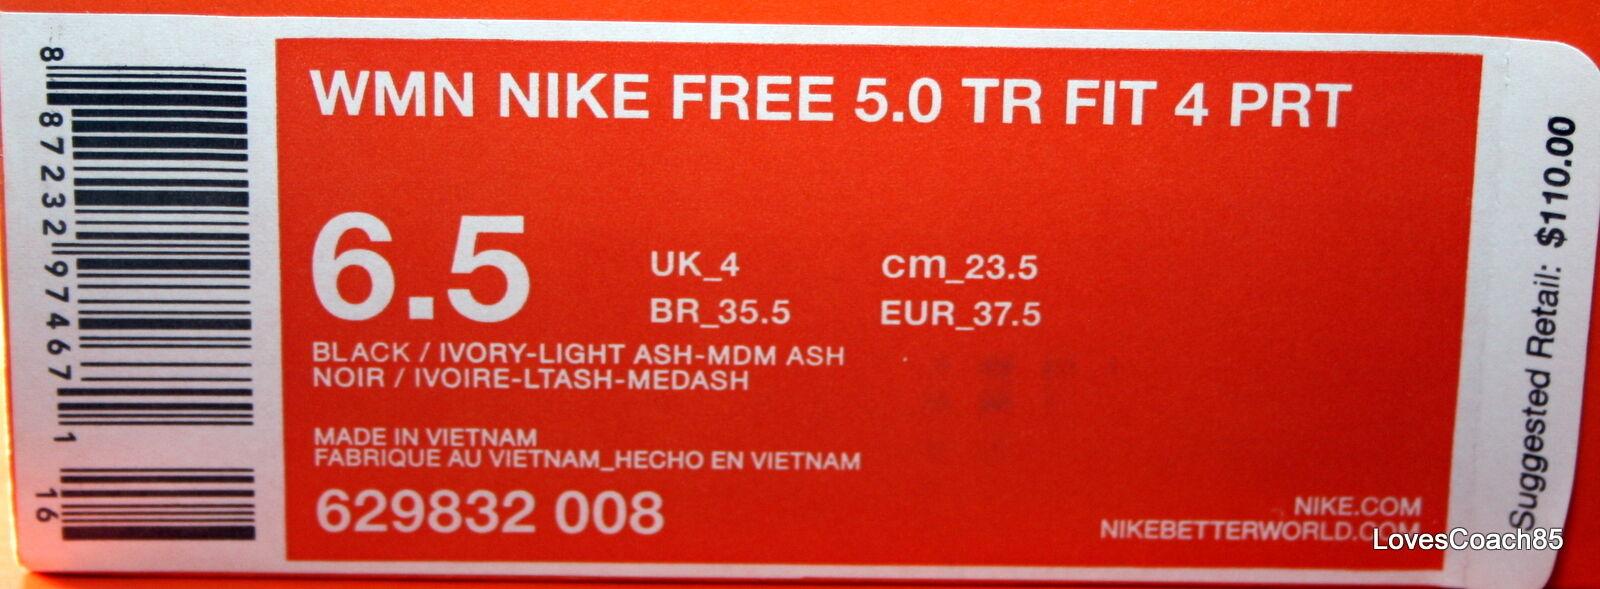 Wmns Nike Free 5.0 TR Fit Fit Fit 4 PRT Black Ivory-Lt Ash-Med Ash 629832-008 NIB 459e7f